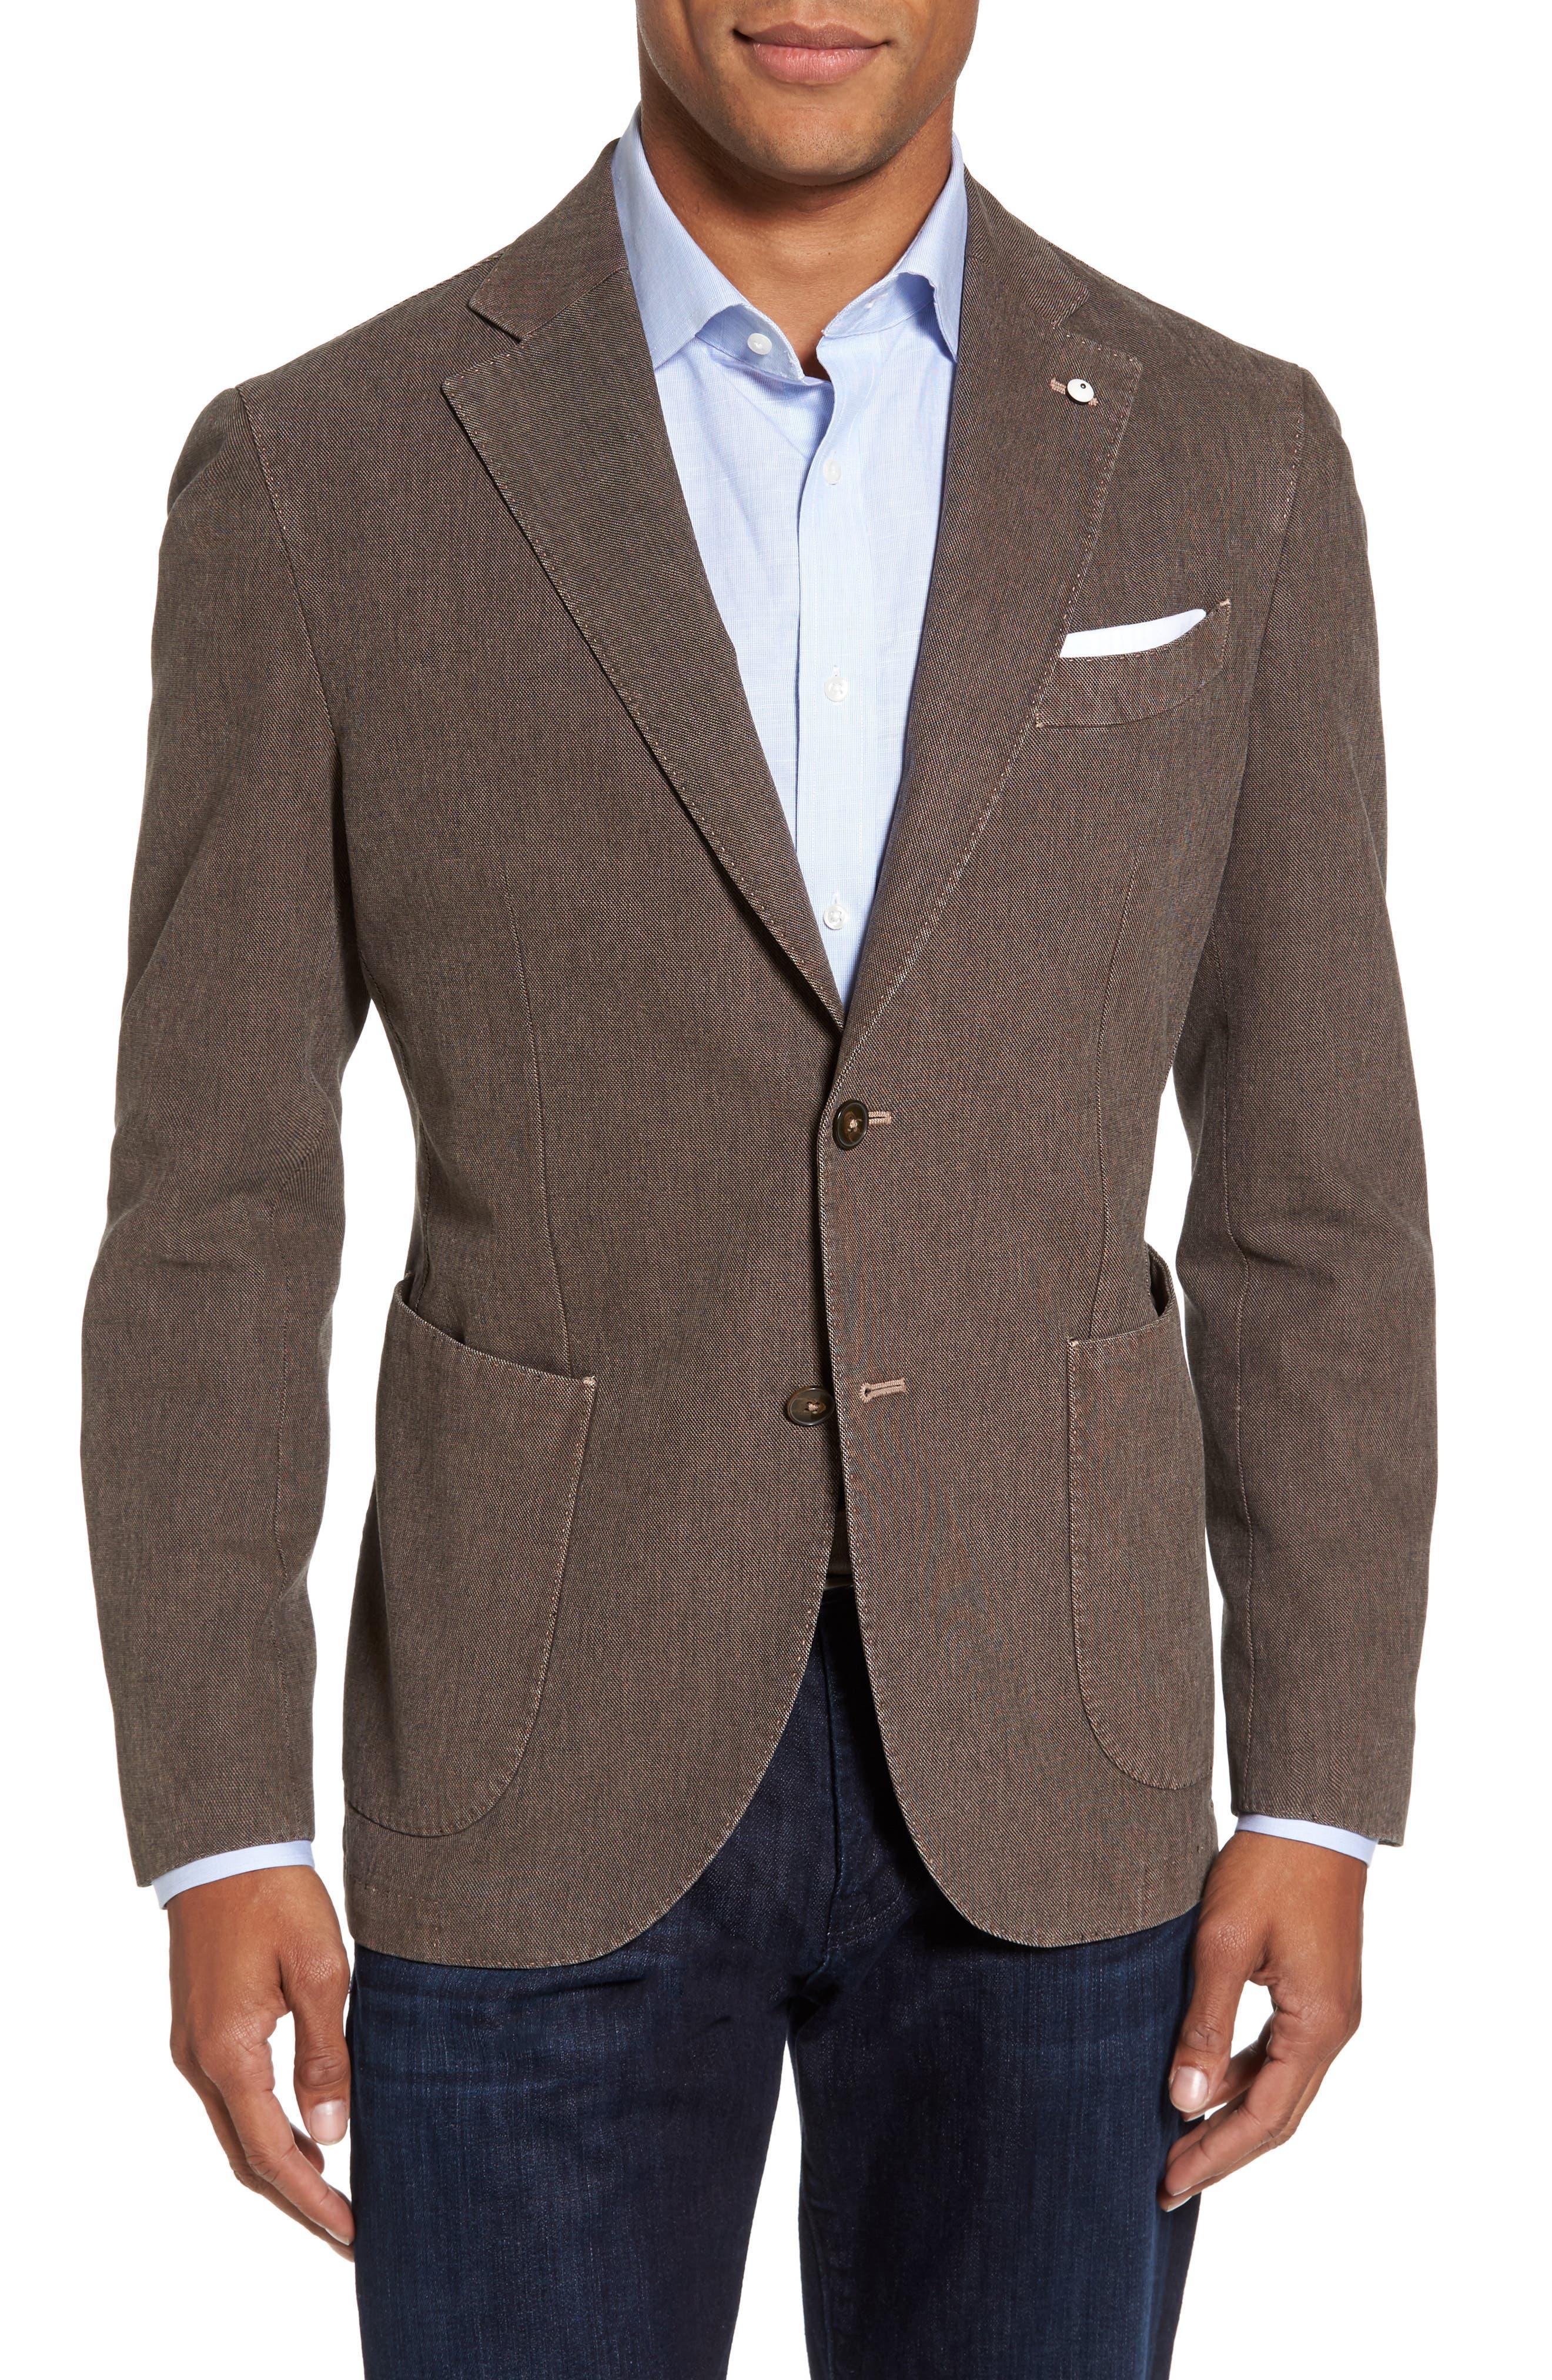 L.B.M. 1911 Classic Fit Cotton Blend Blazer